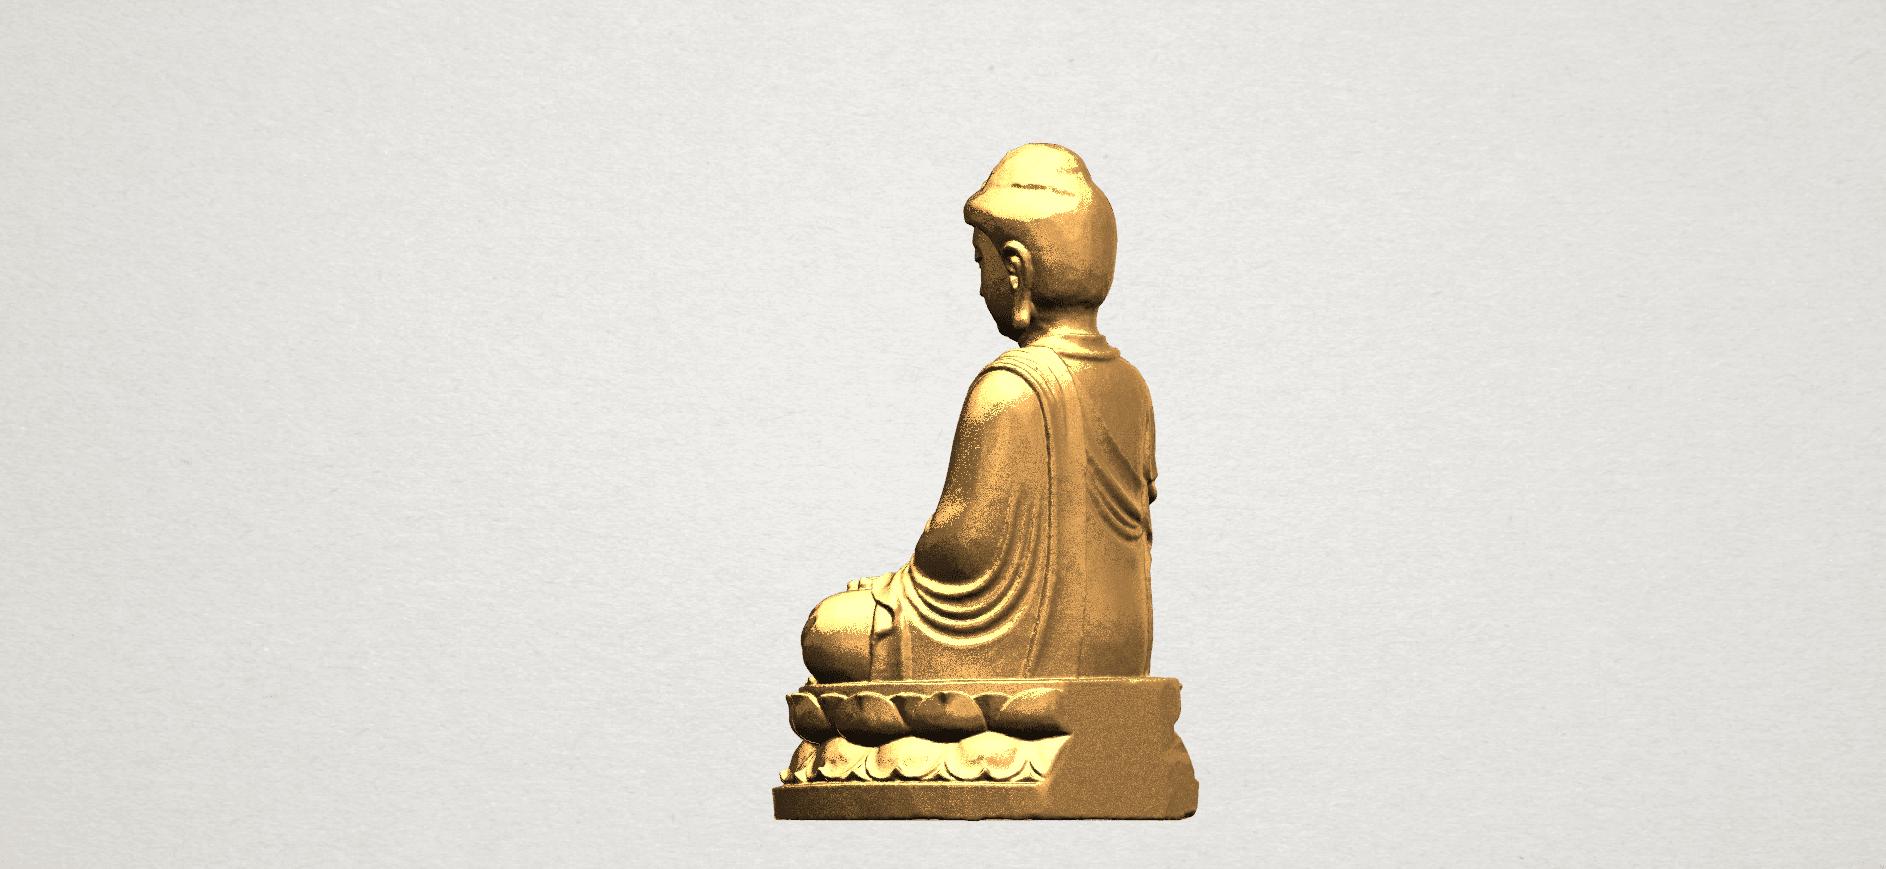 Gautama Buddha young - C03.png Télécharger fichier STL gratuit Gautama Bouddha Bouddha • Objet imprimable en 3D, GeorgesNikkei